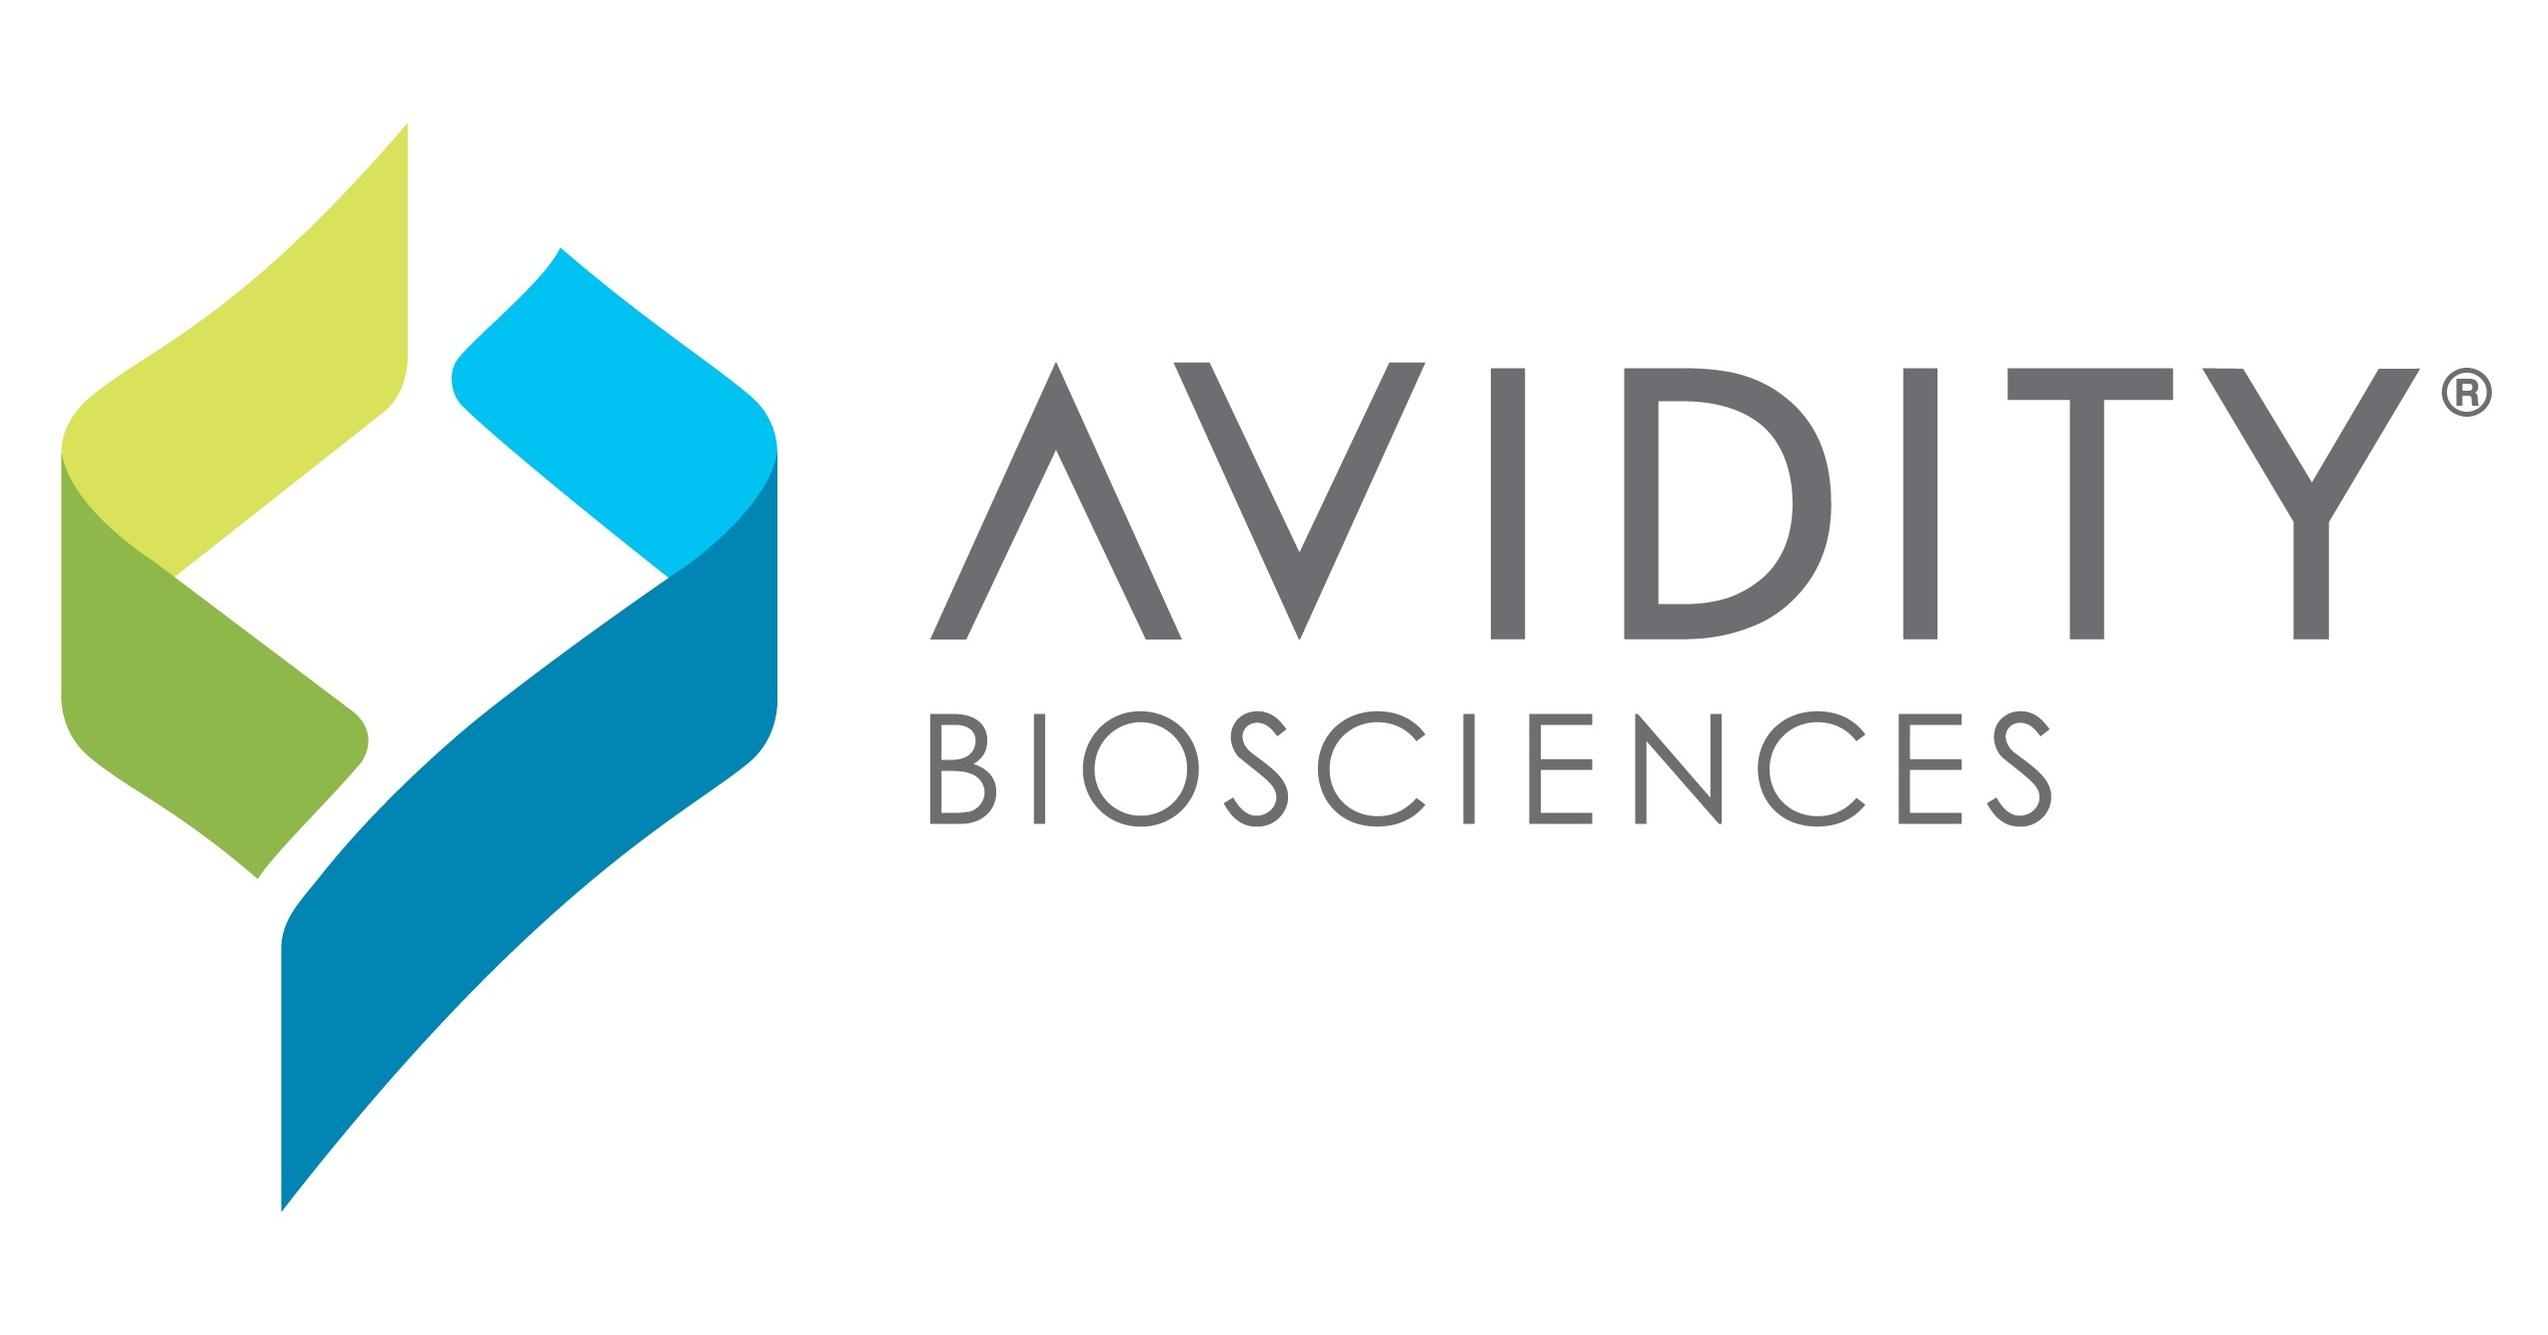 Avidity Biosciences Logo jpg?p=facebook.